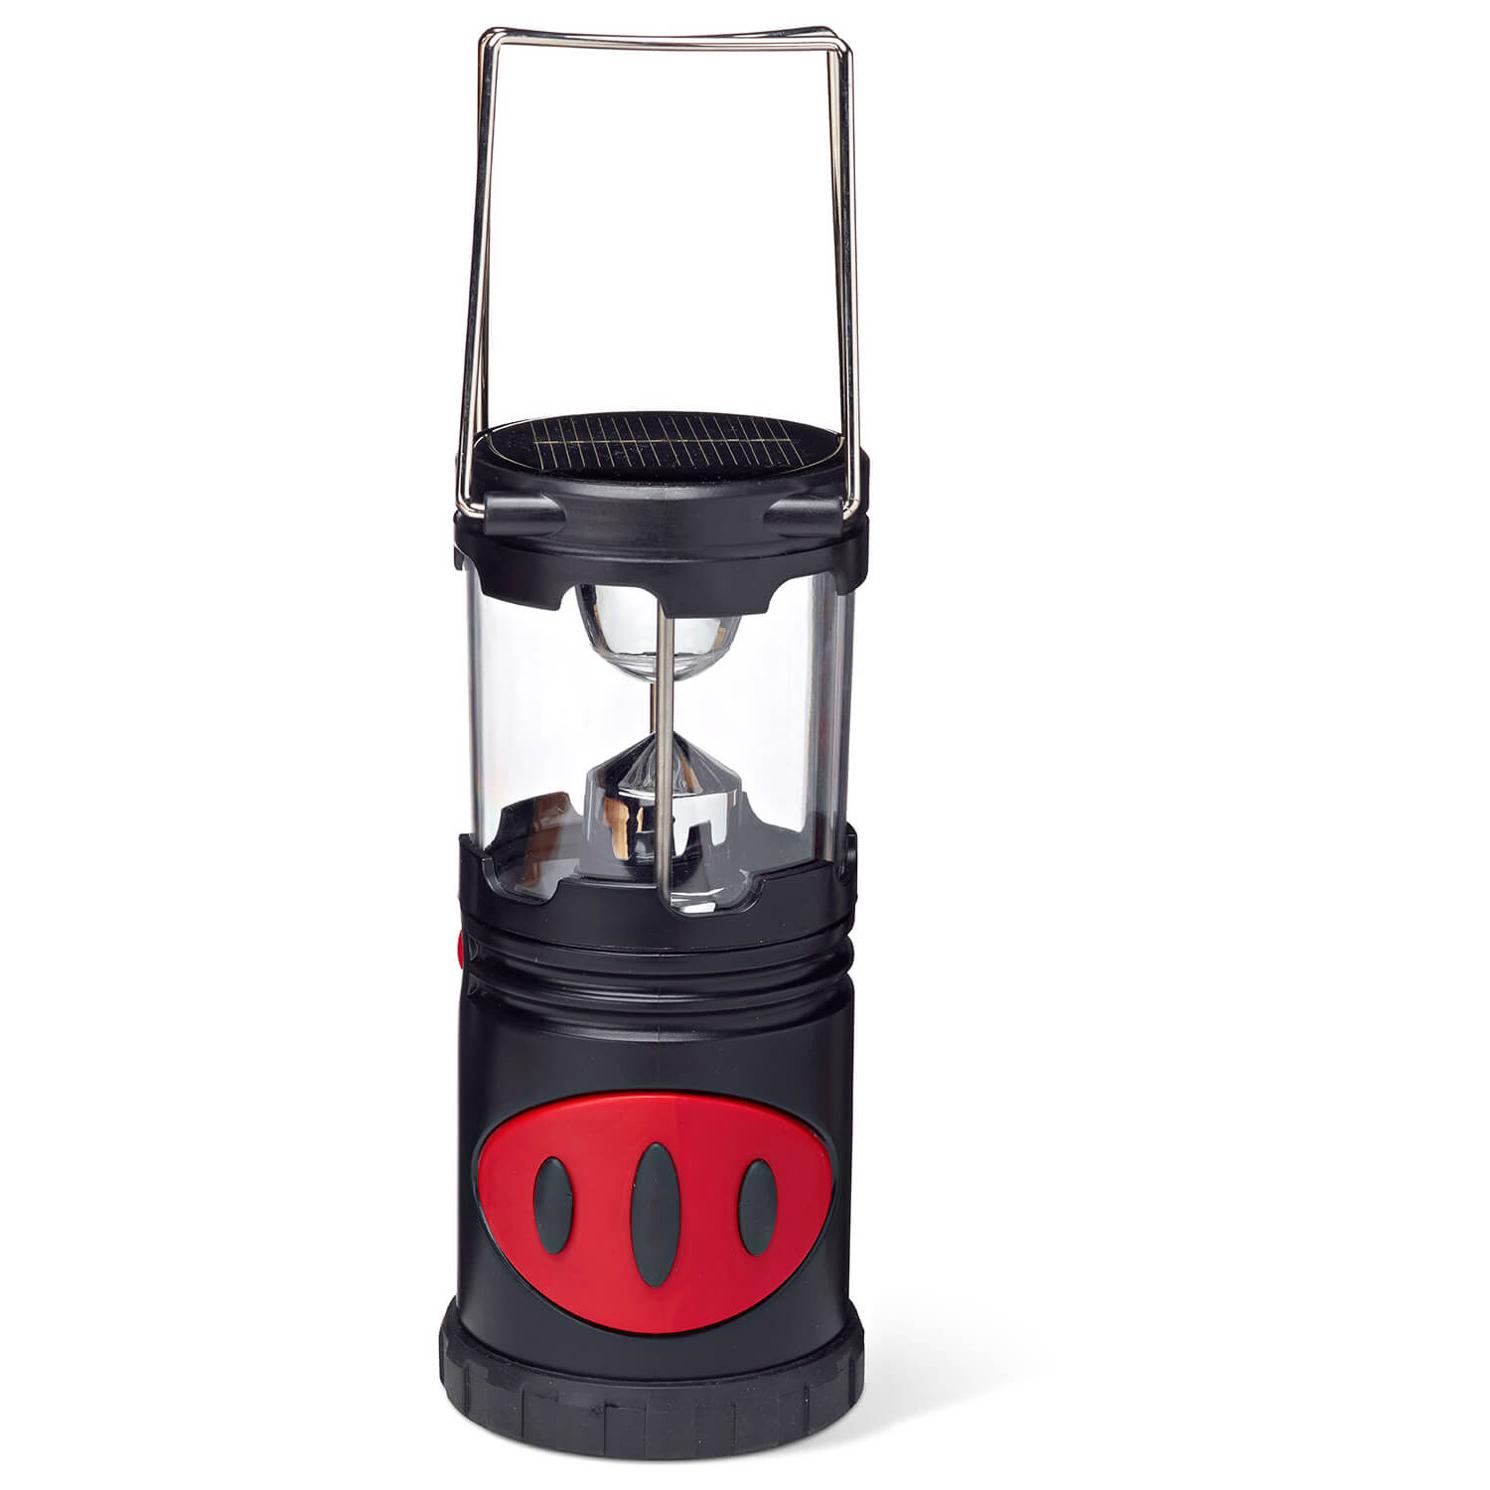 primus solar camping lantern led lampe online kaufen. Black Bedroom Furniture Sets. Home Design Ideas